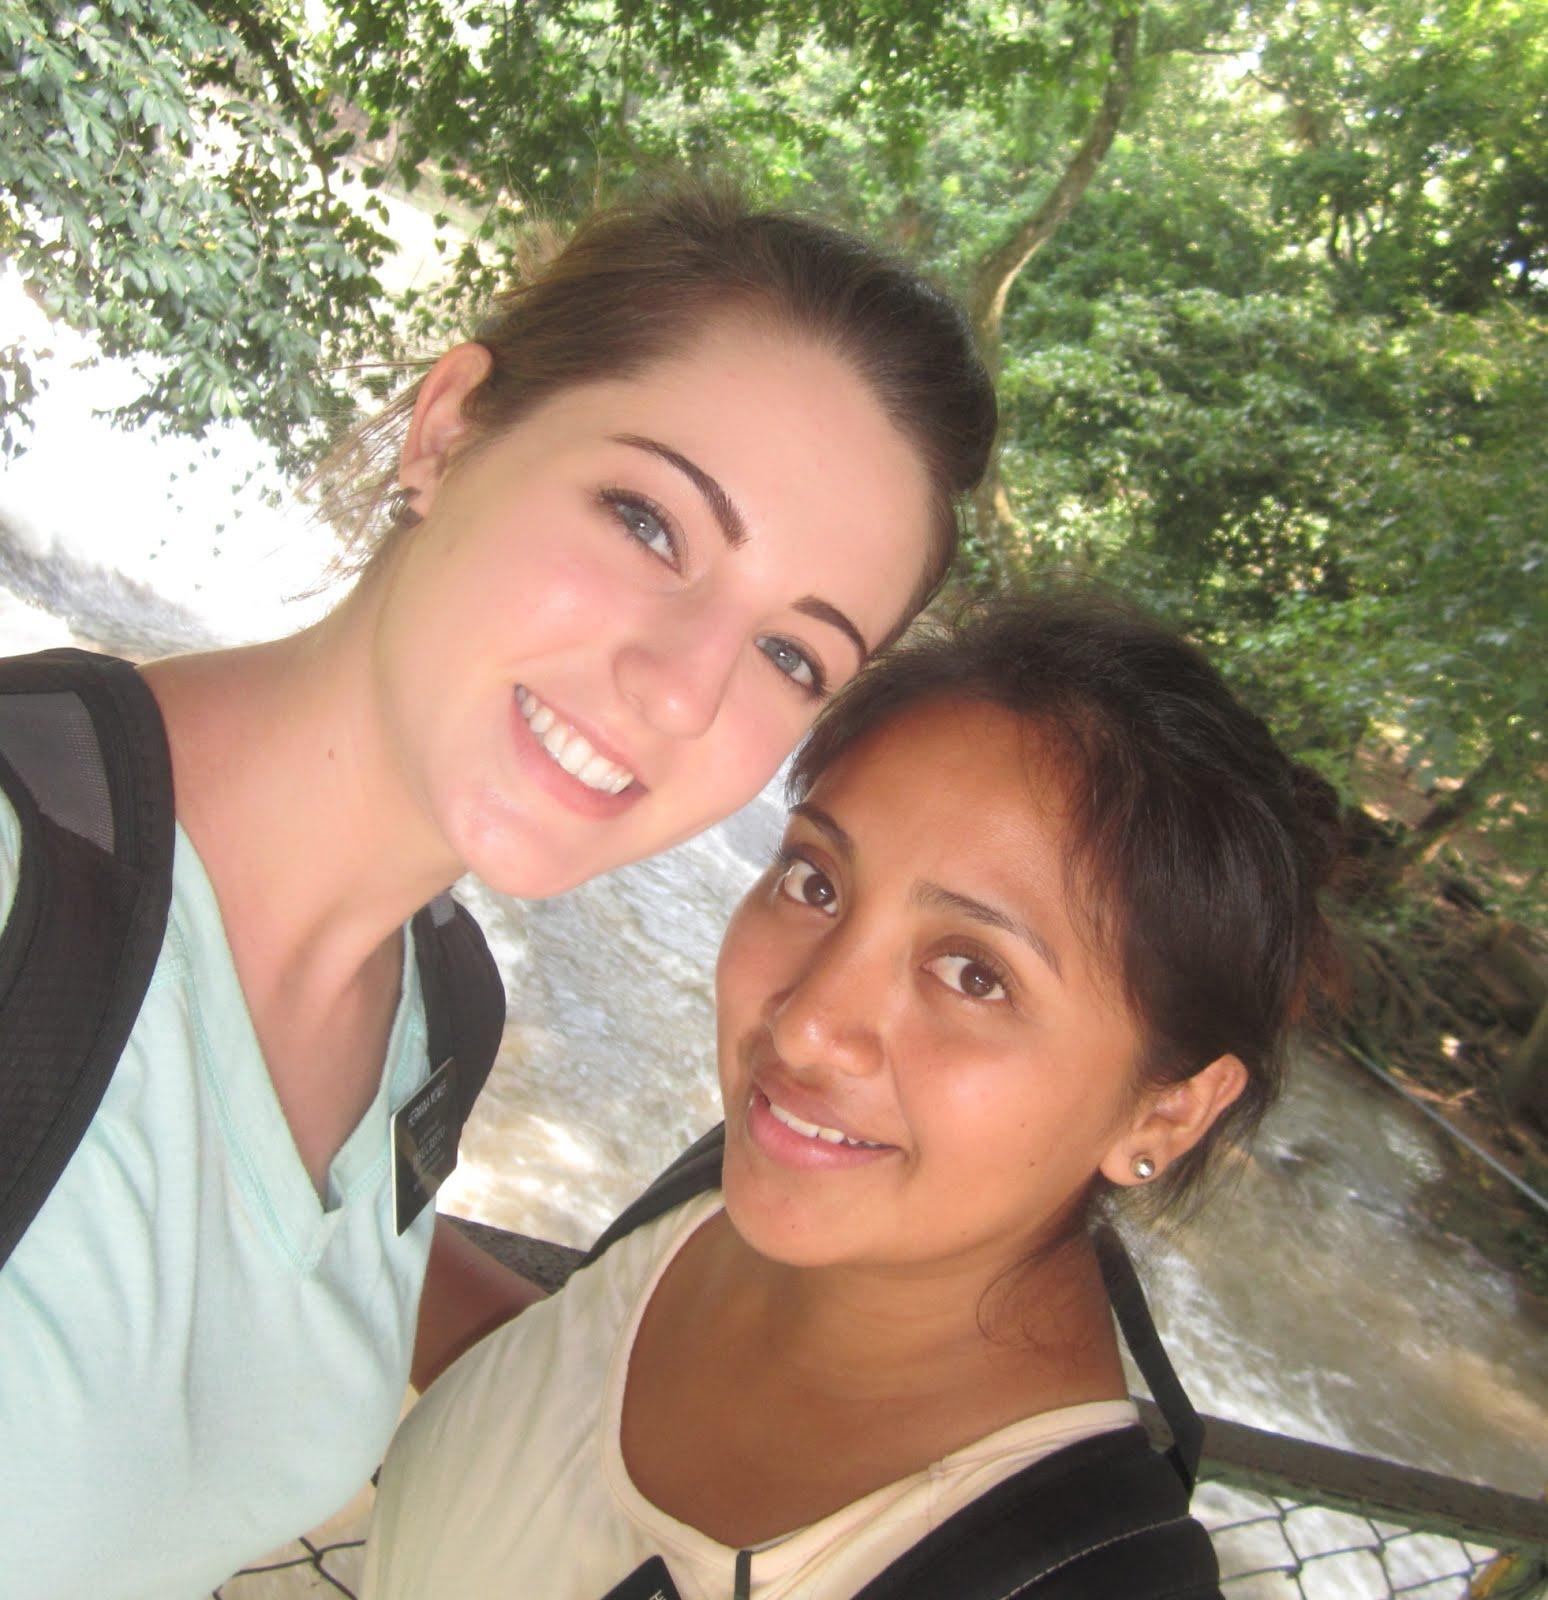 Hna Mower & Hna Escobar - Cataratas de Pulhapanzak